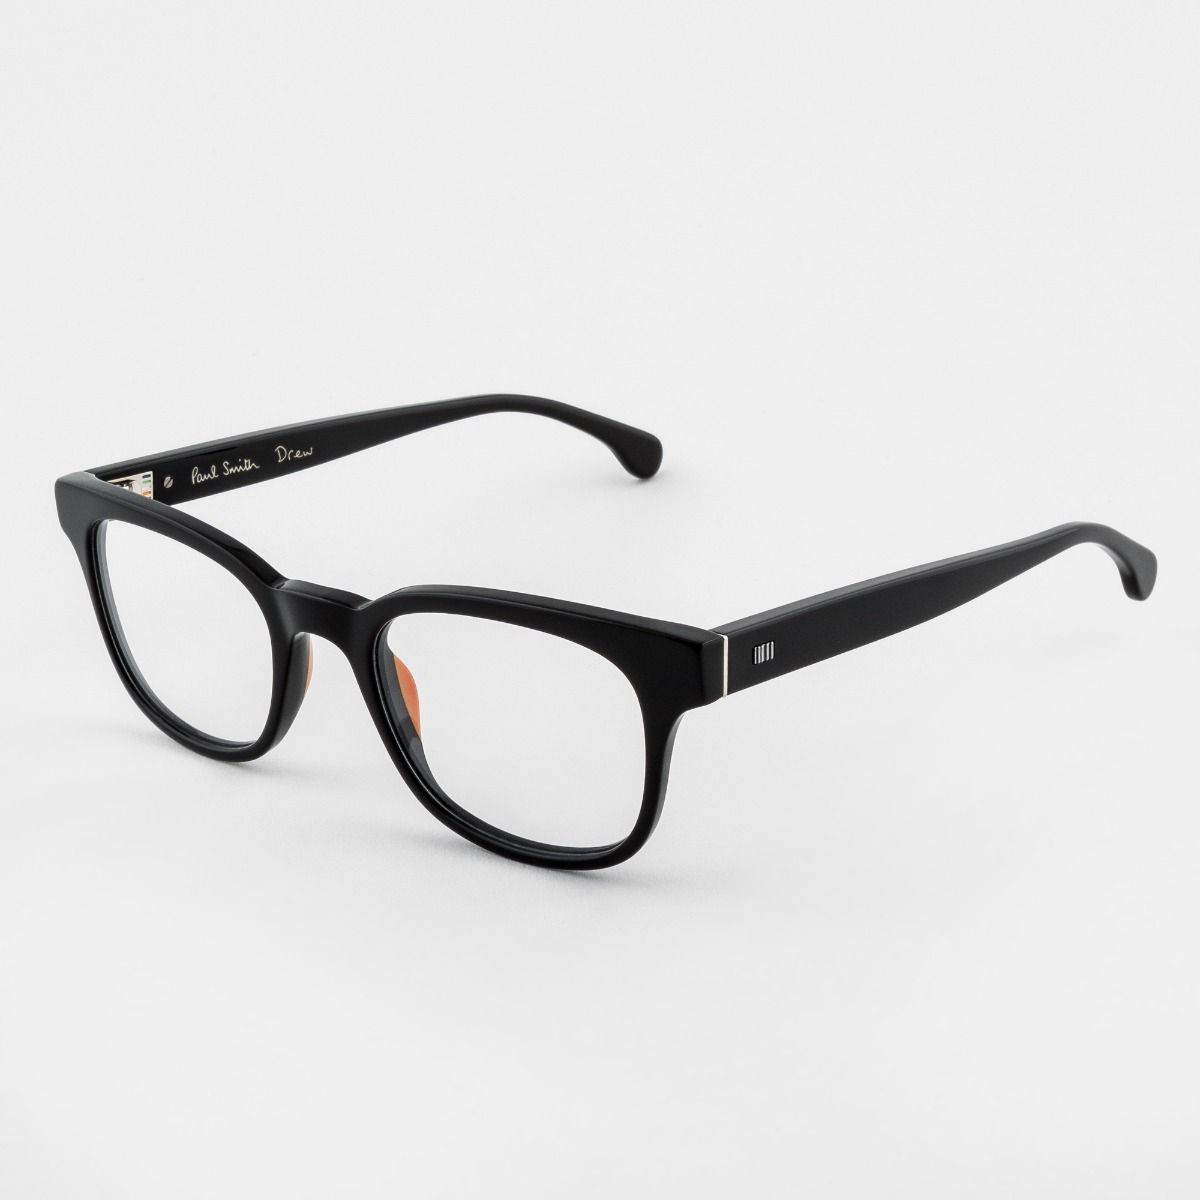 Paul Smith Drew Optical Square Glasses